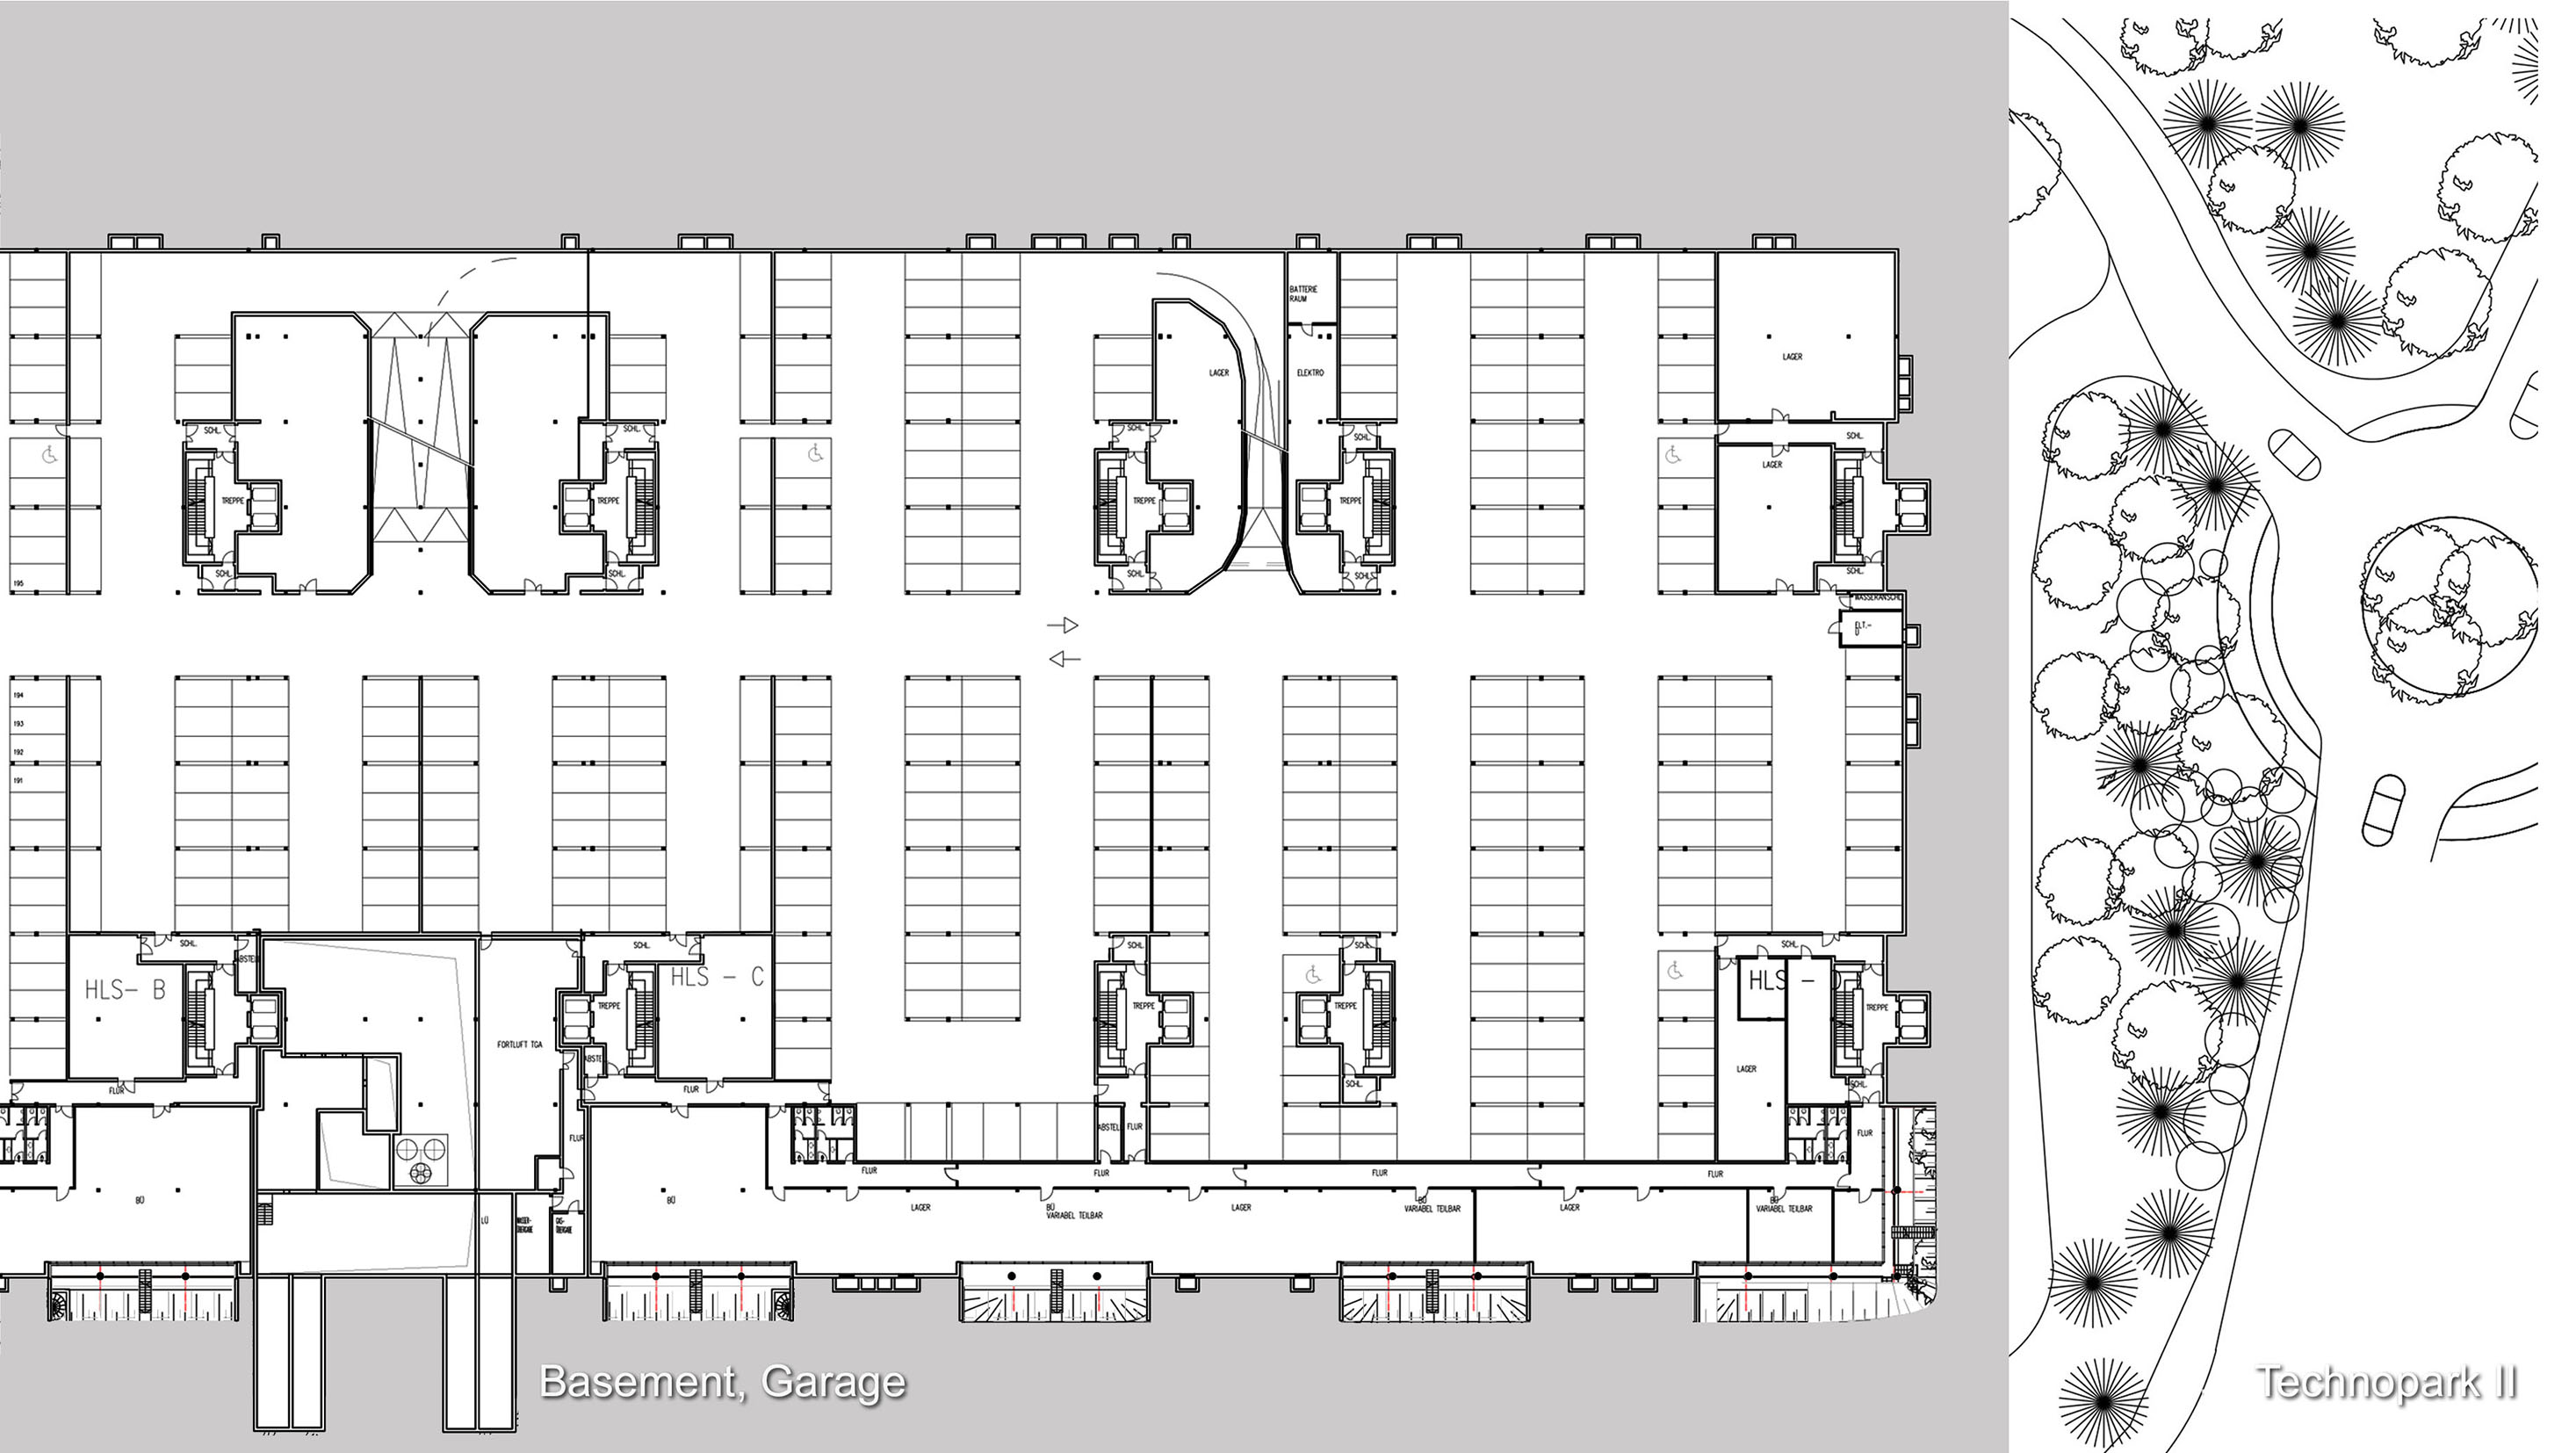 8_Technopark II Basement